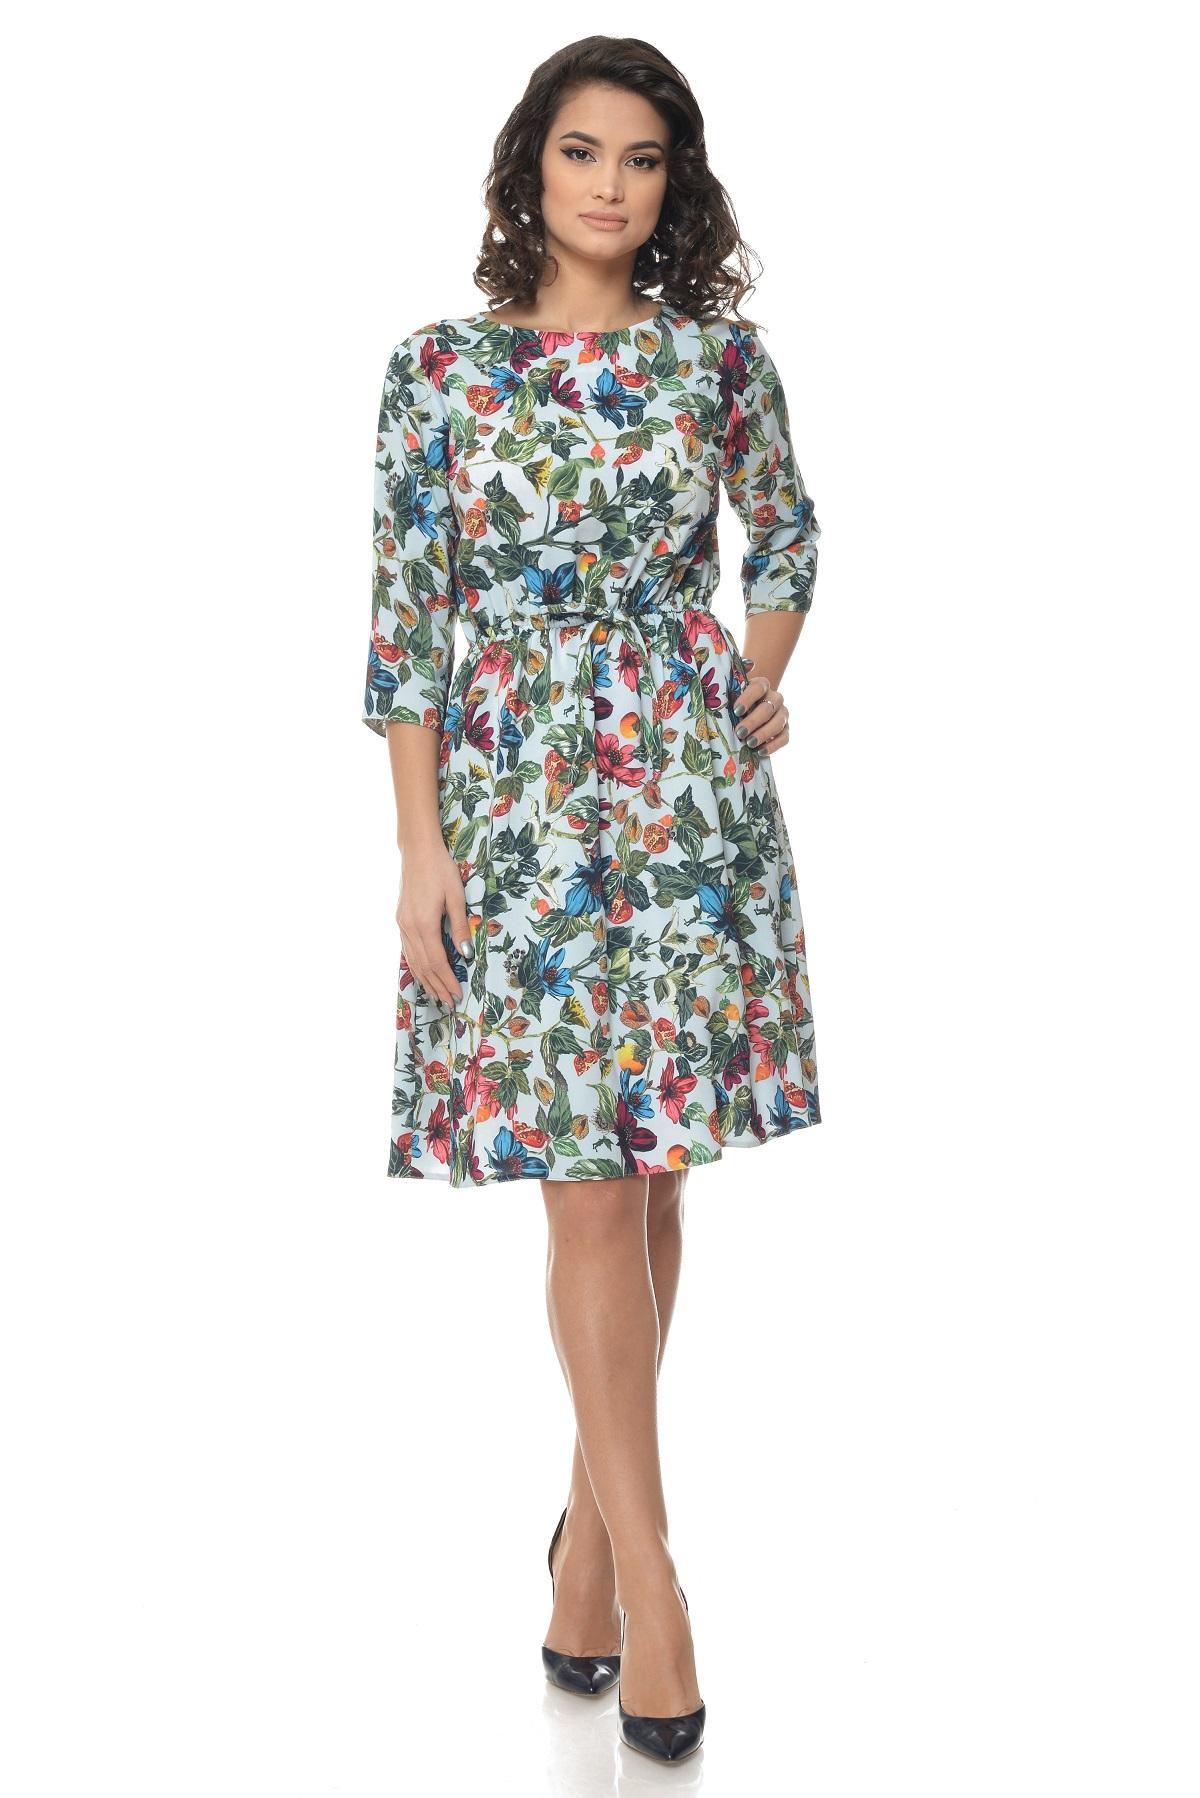 Rochie Multicolor cu snur in talie si model floral – Eranthe